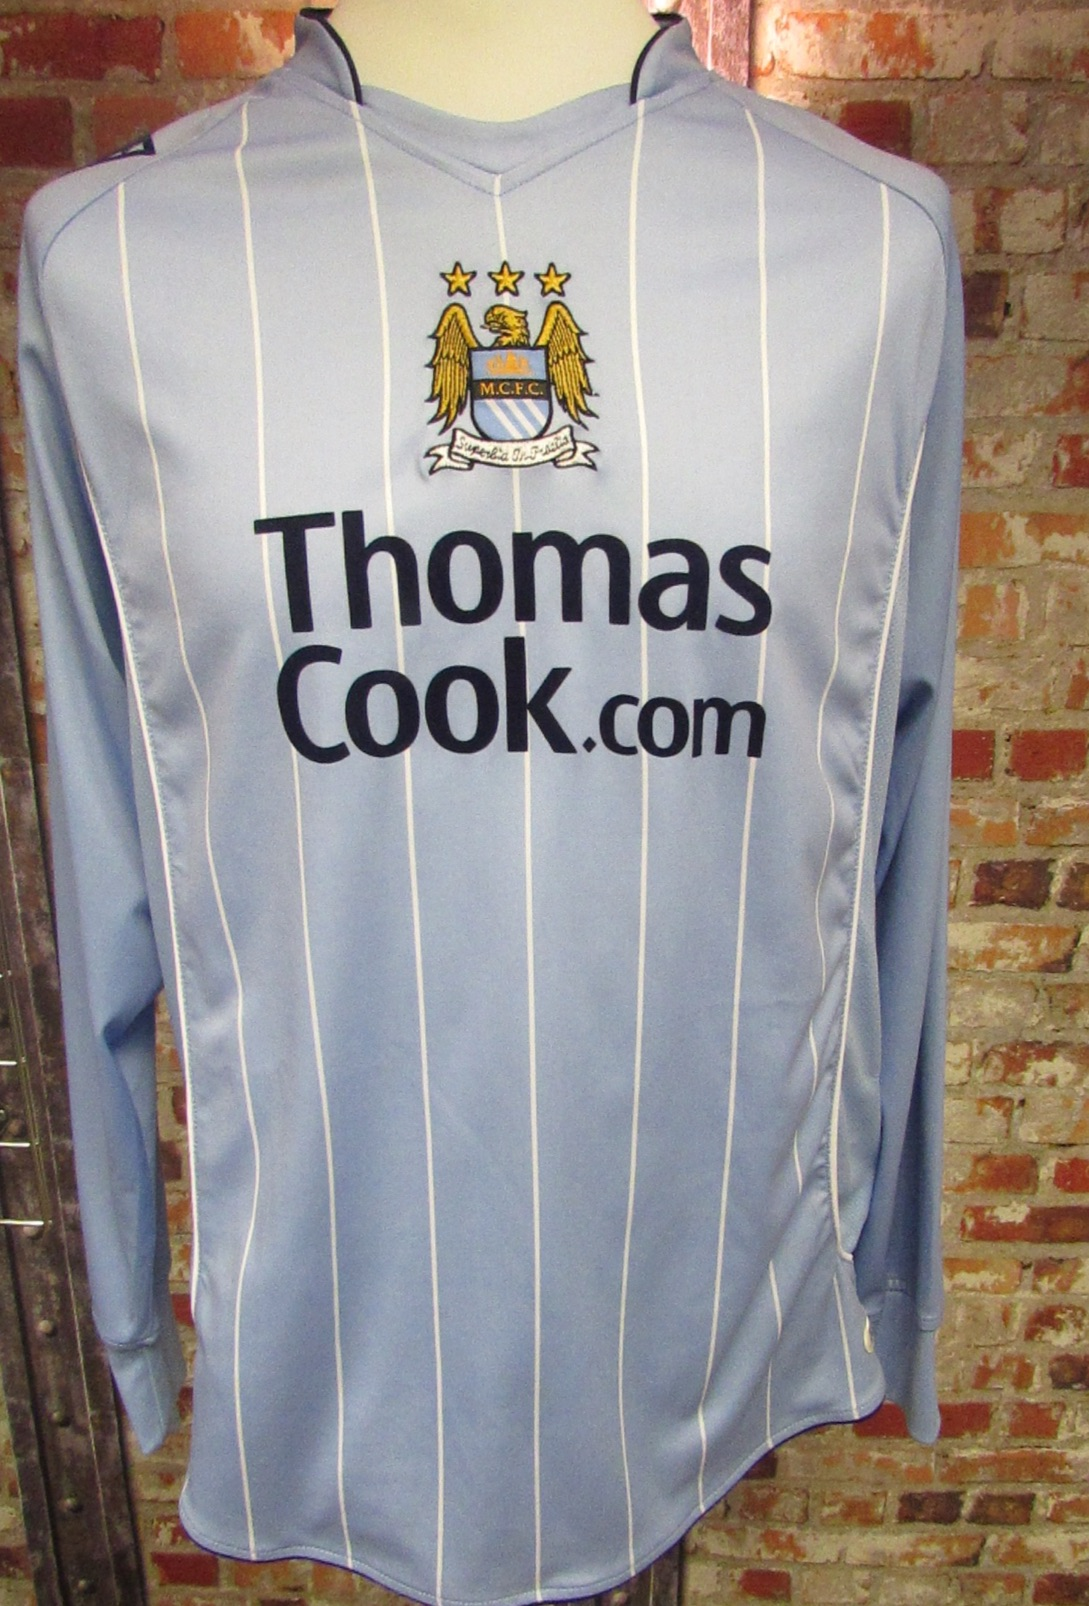 Le Coq Sportif Manchester City 2007/08 Home Shirt